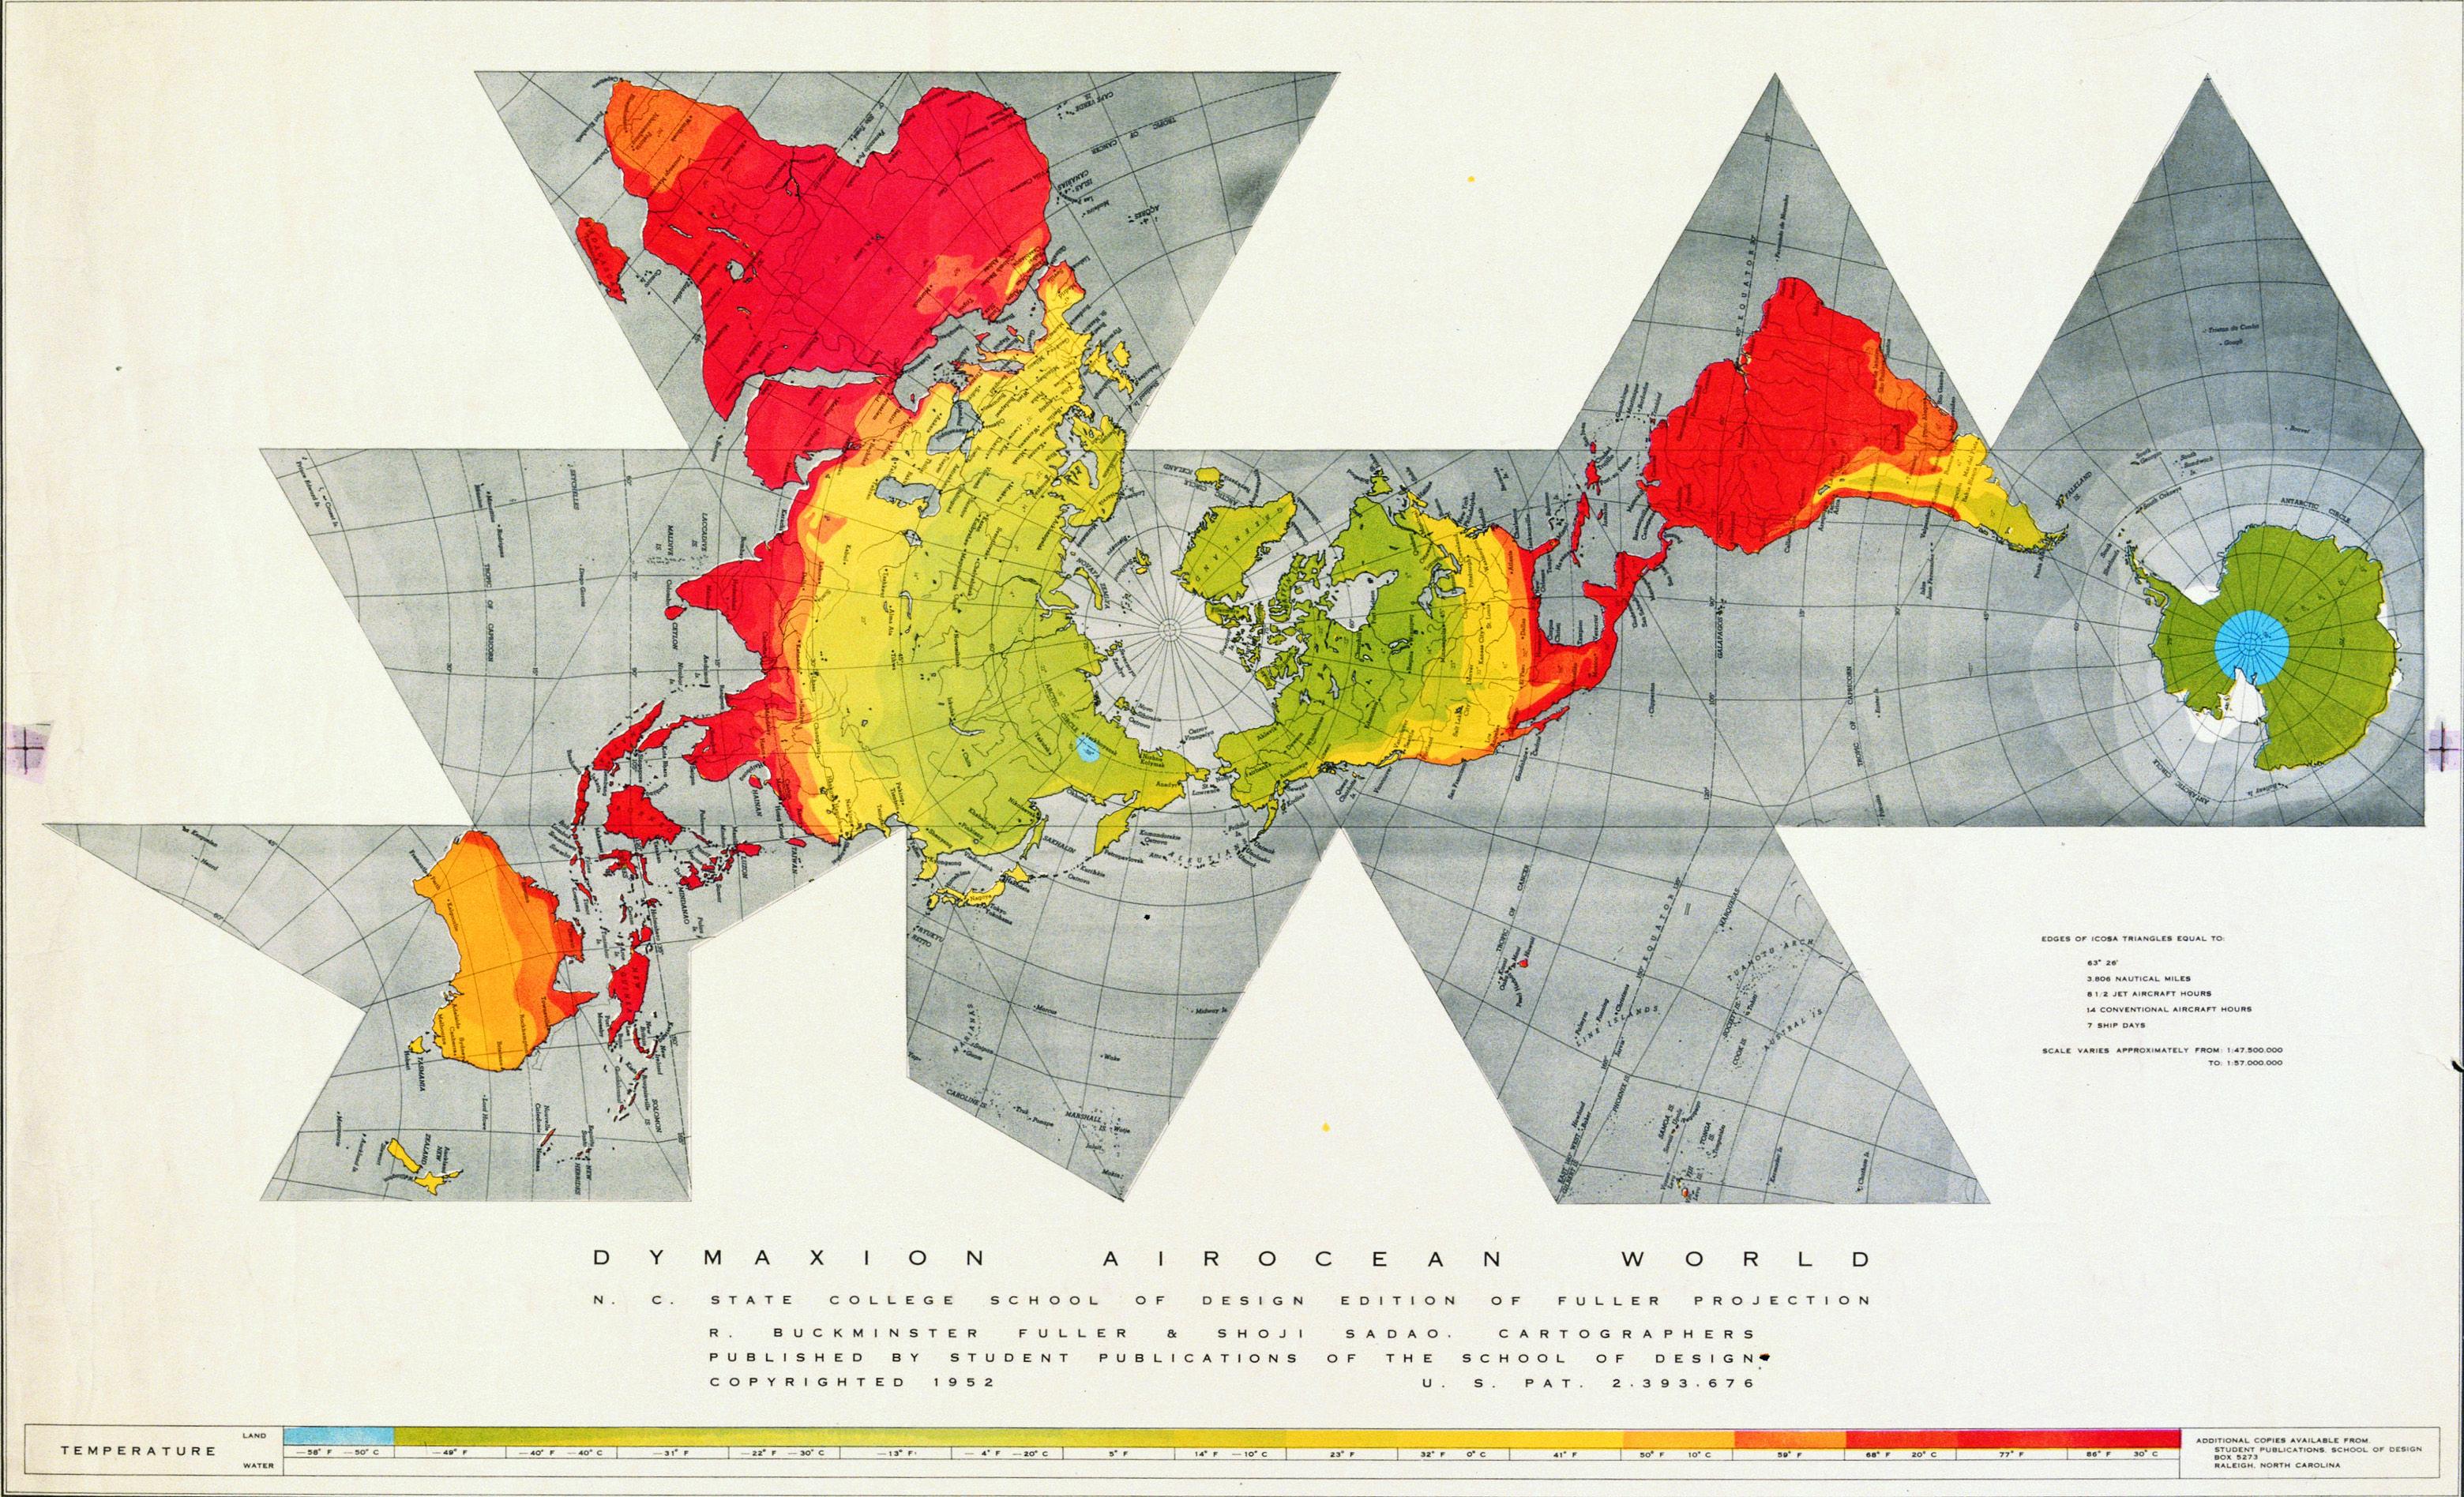 Pin by derek garbellini on science pinterest design inspiration design inspiration world mapsmap gumiabroncs Gallery